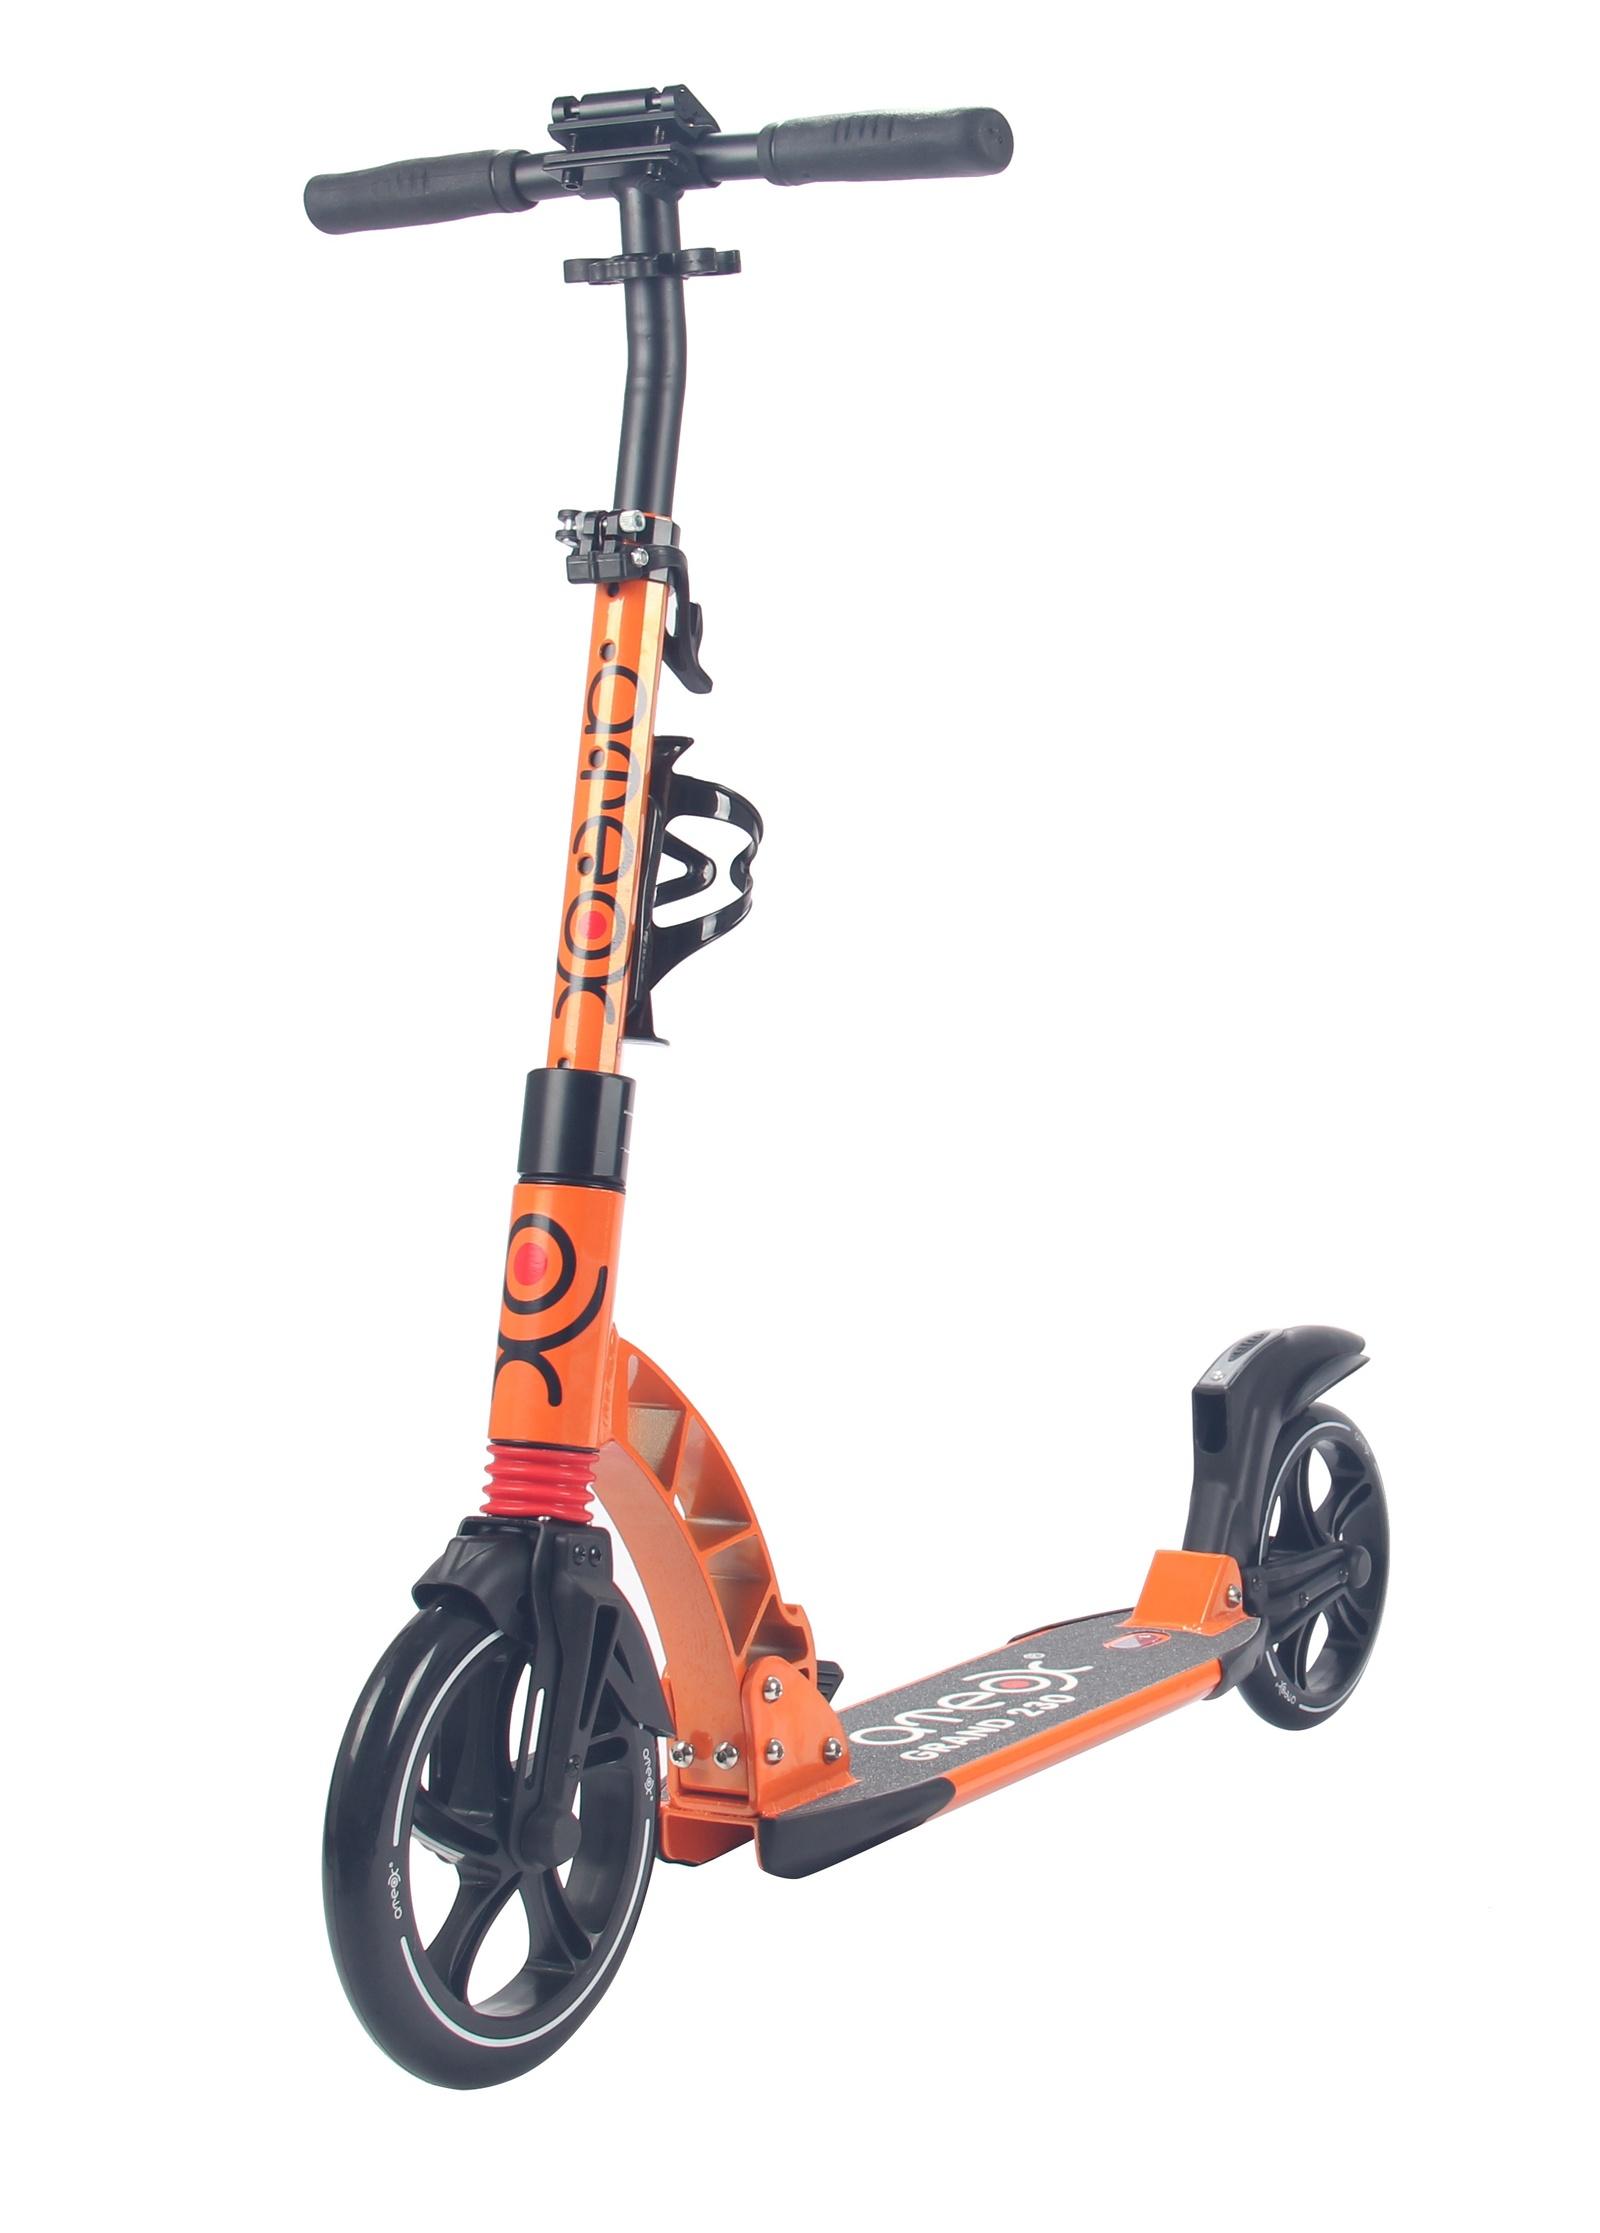 Самокат для взрослых Аteox GRAND 230 (Оранжевый)